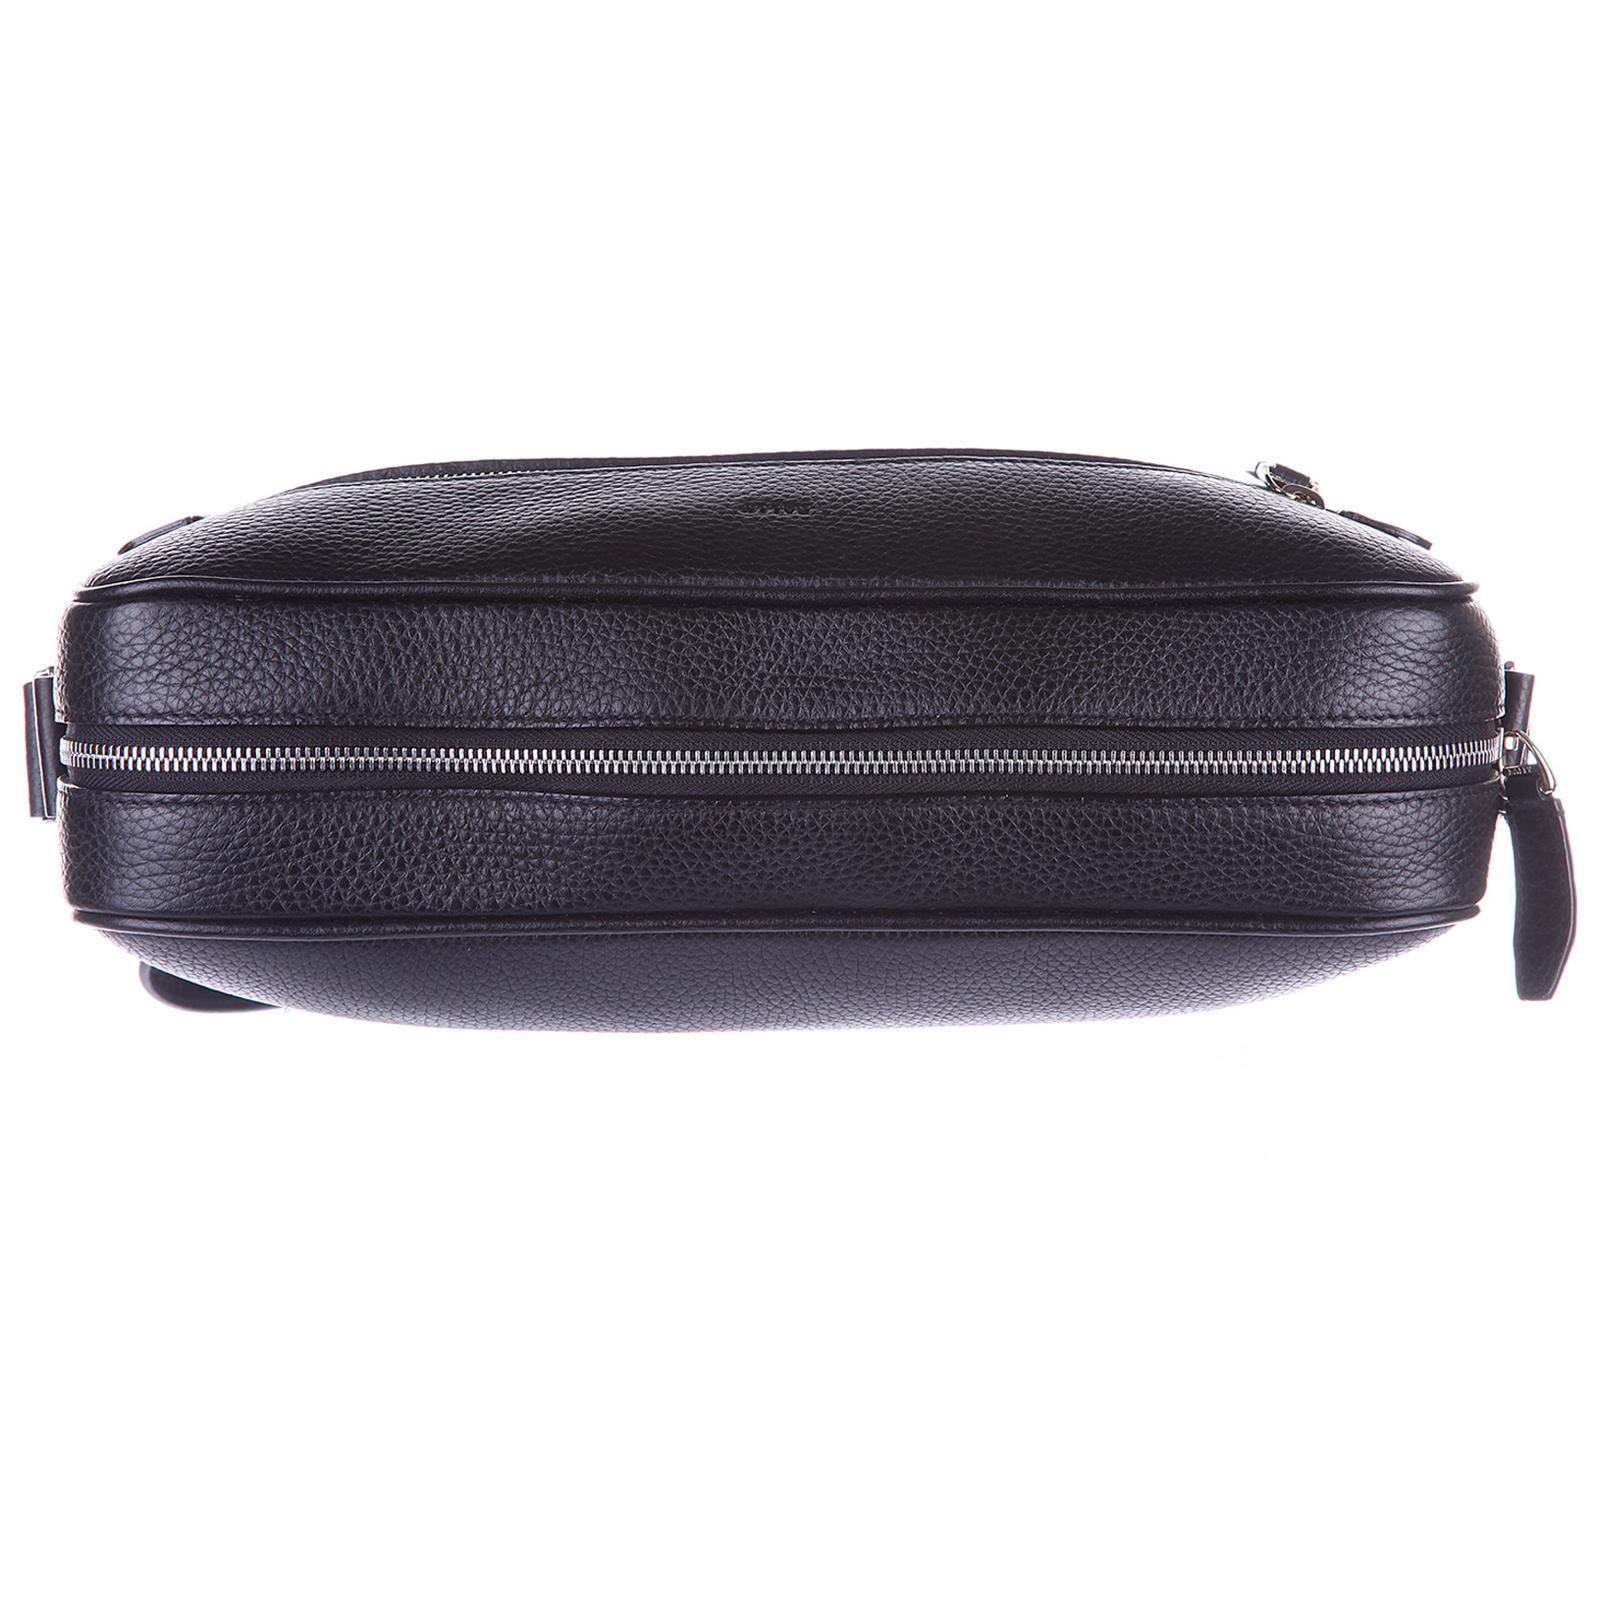 Men's leather cross-body messenger shoulder bag capa